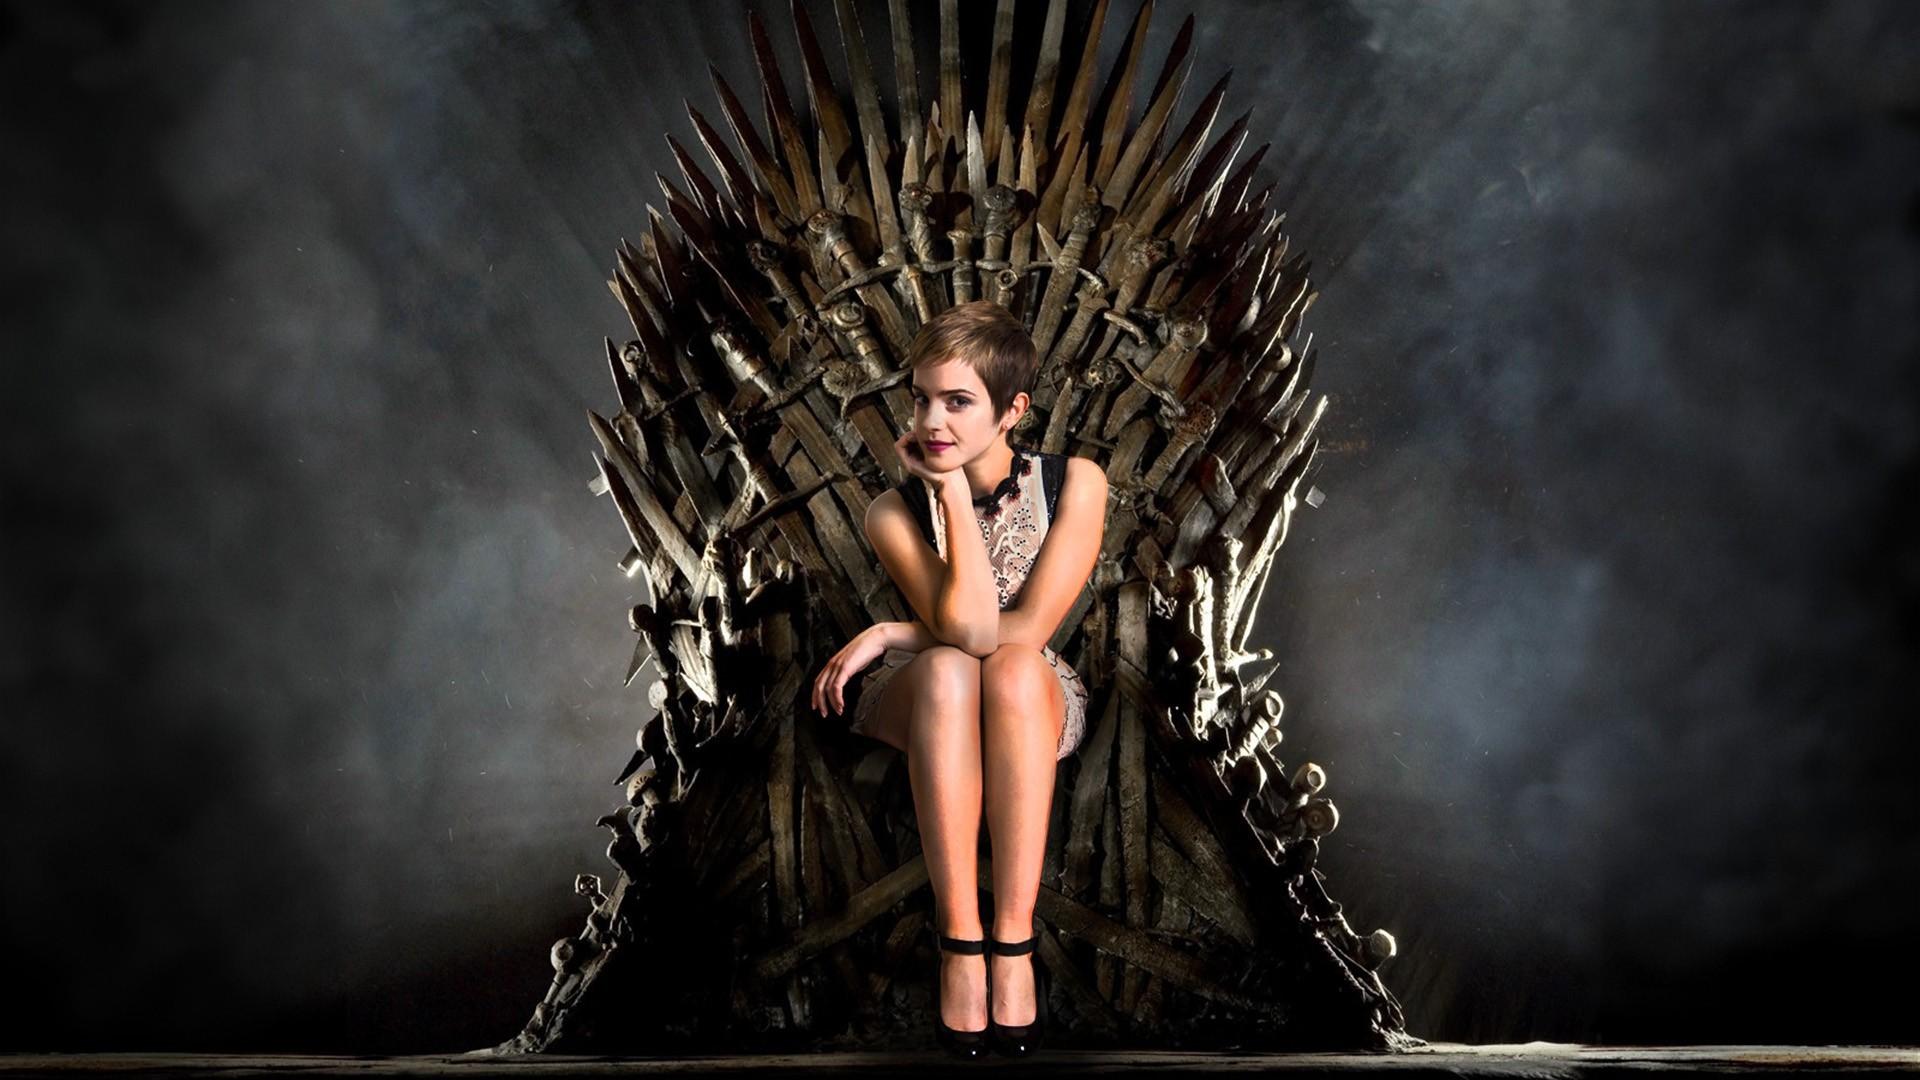 Game_of_Thrones_Season_5-HD-Wallpapers-1080p | Download Free Desktop .